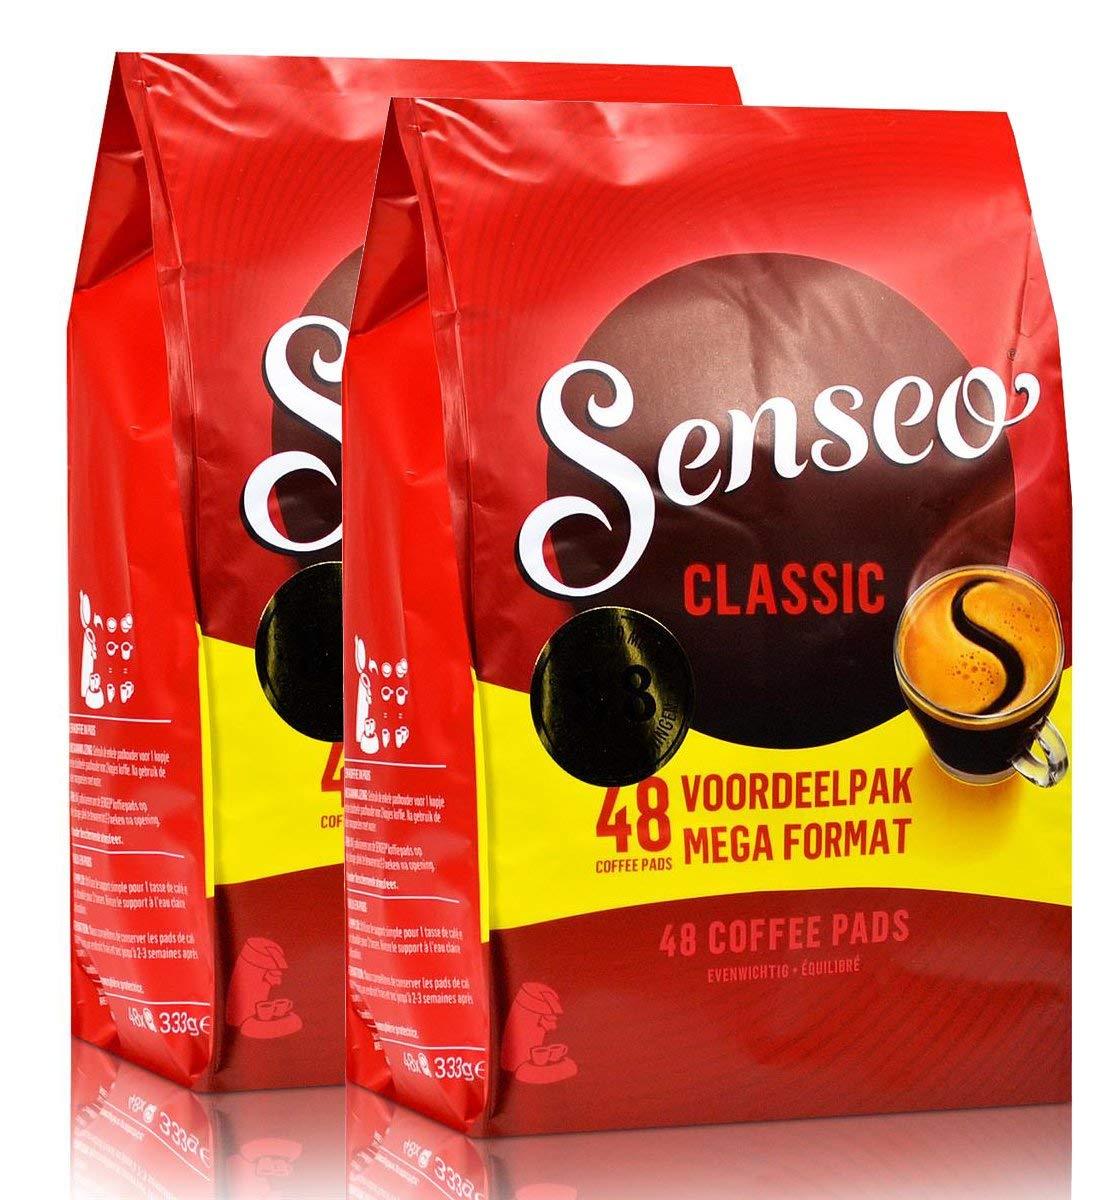 Senseo Regular / Classic Roast, New Design, Pack of 2, 2 X 48 Coffee Pods